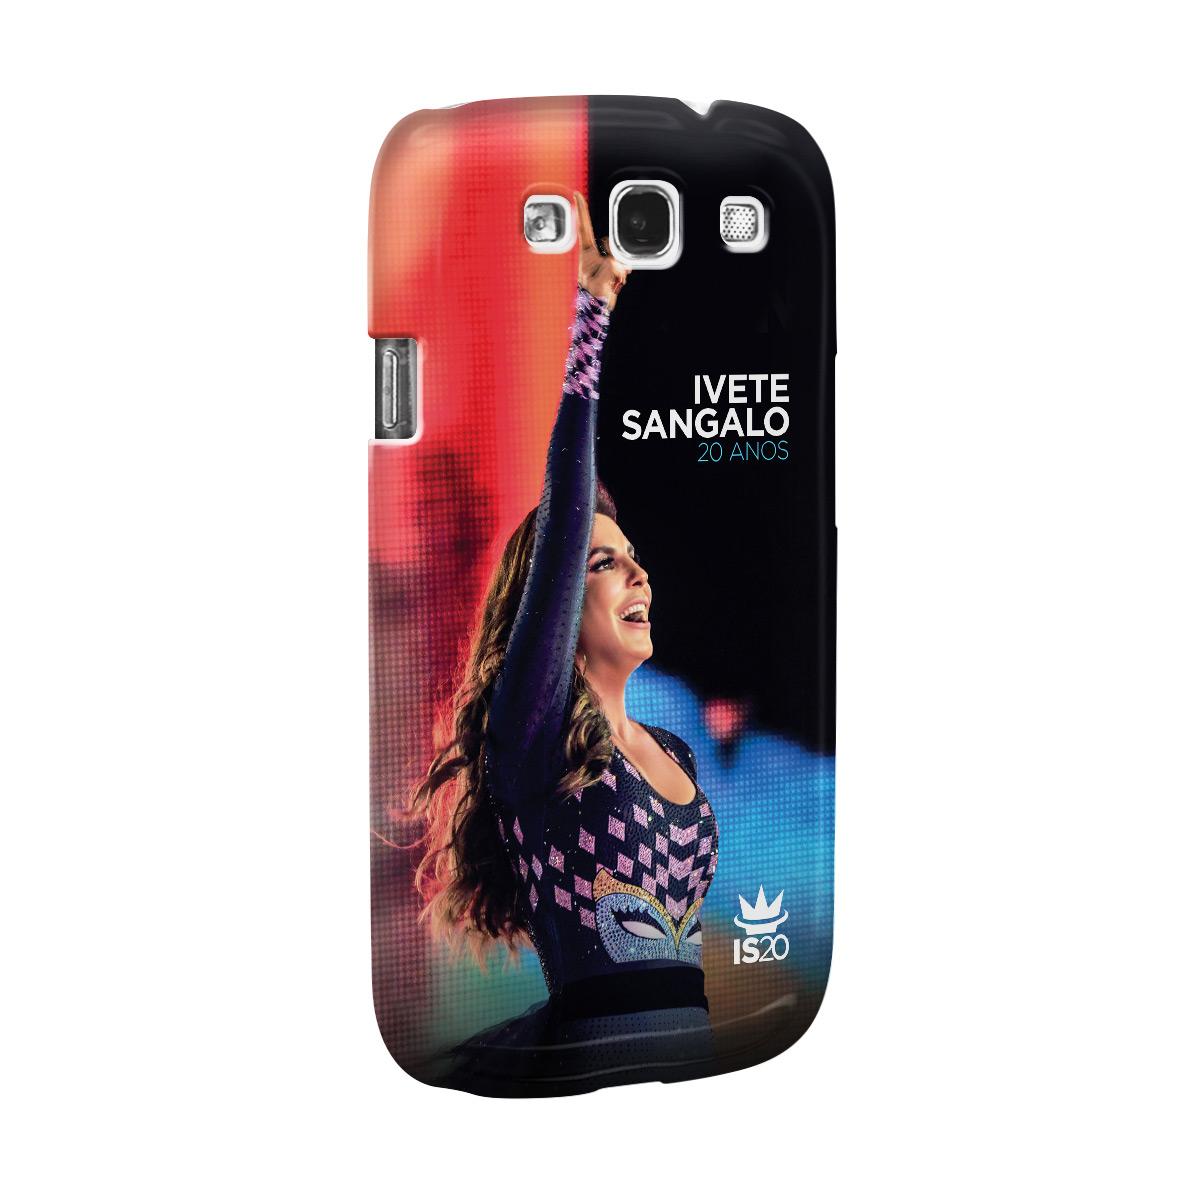 Capa de Celular Samsung Galaxy S3 Ivete Sangalo Capa 20 Anos